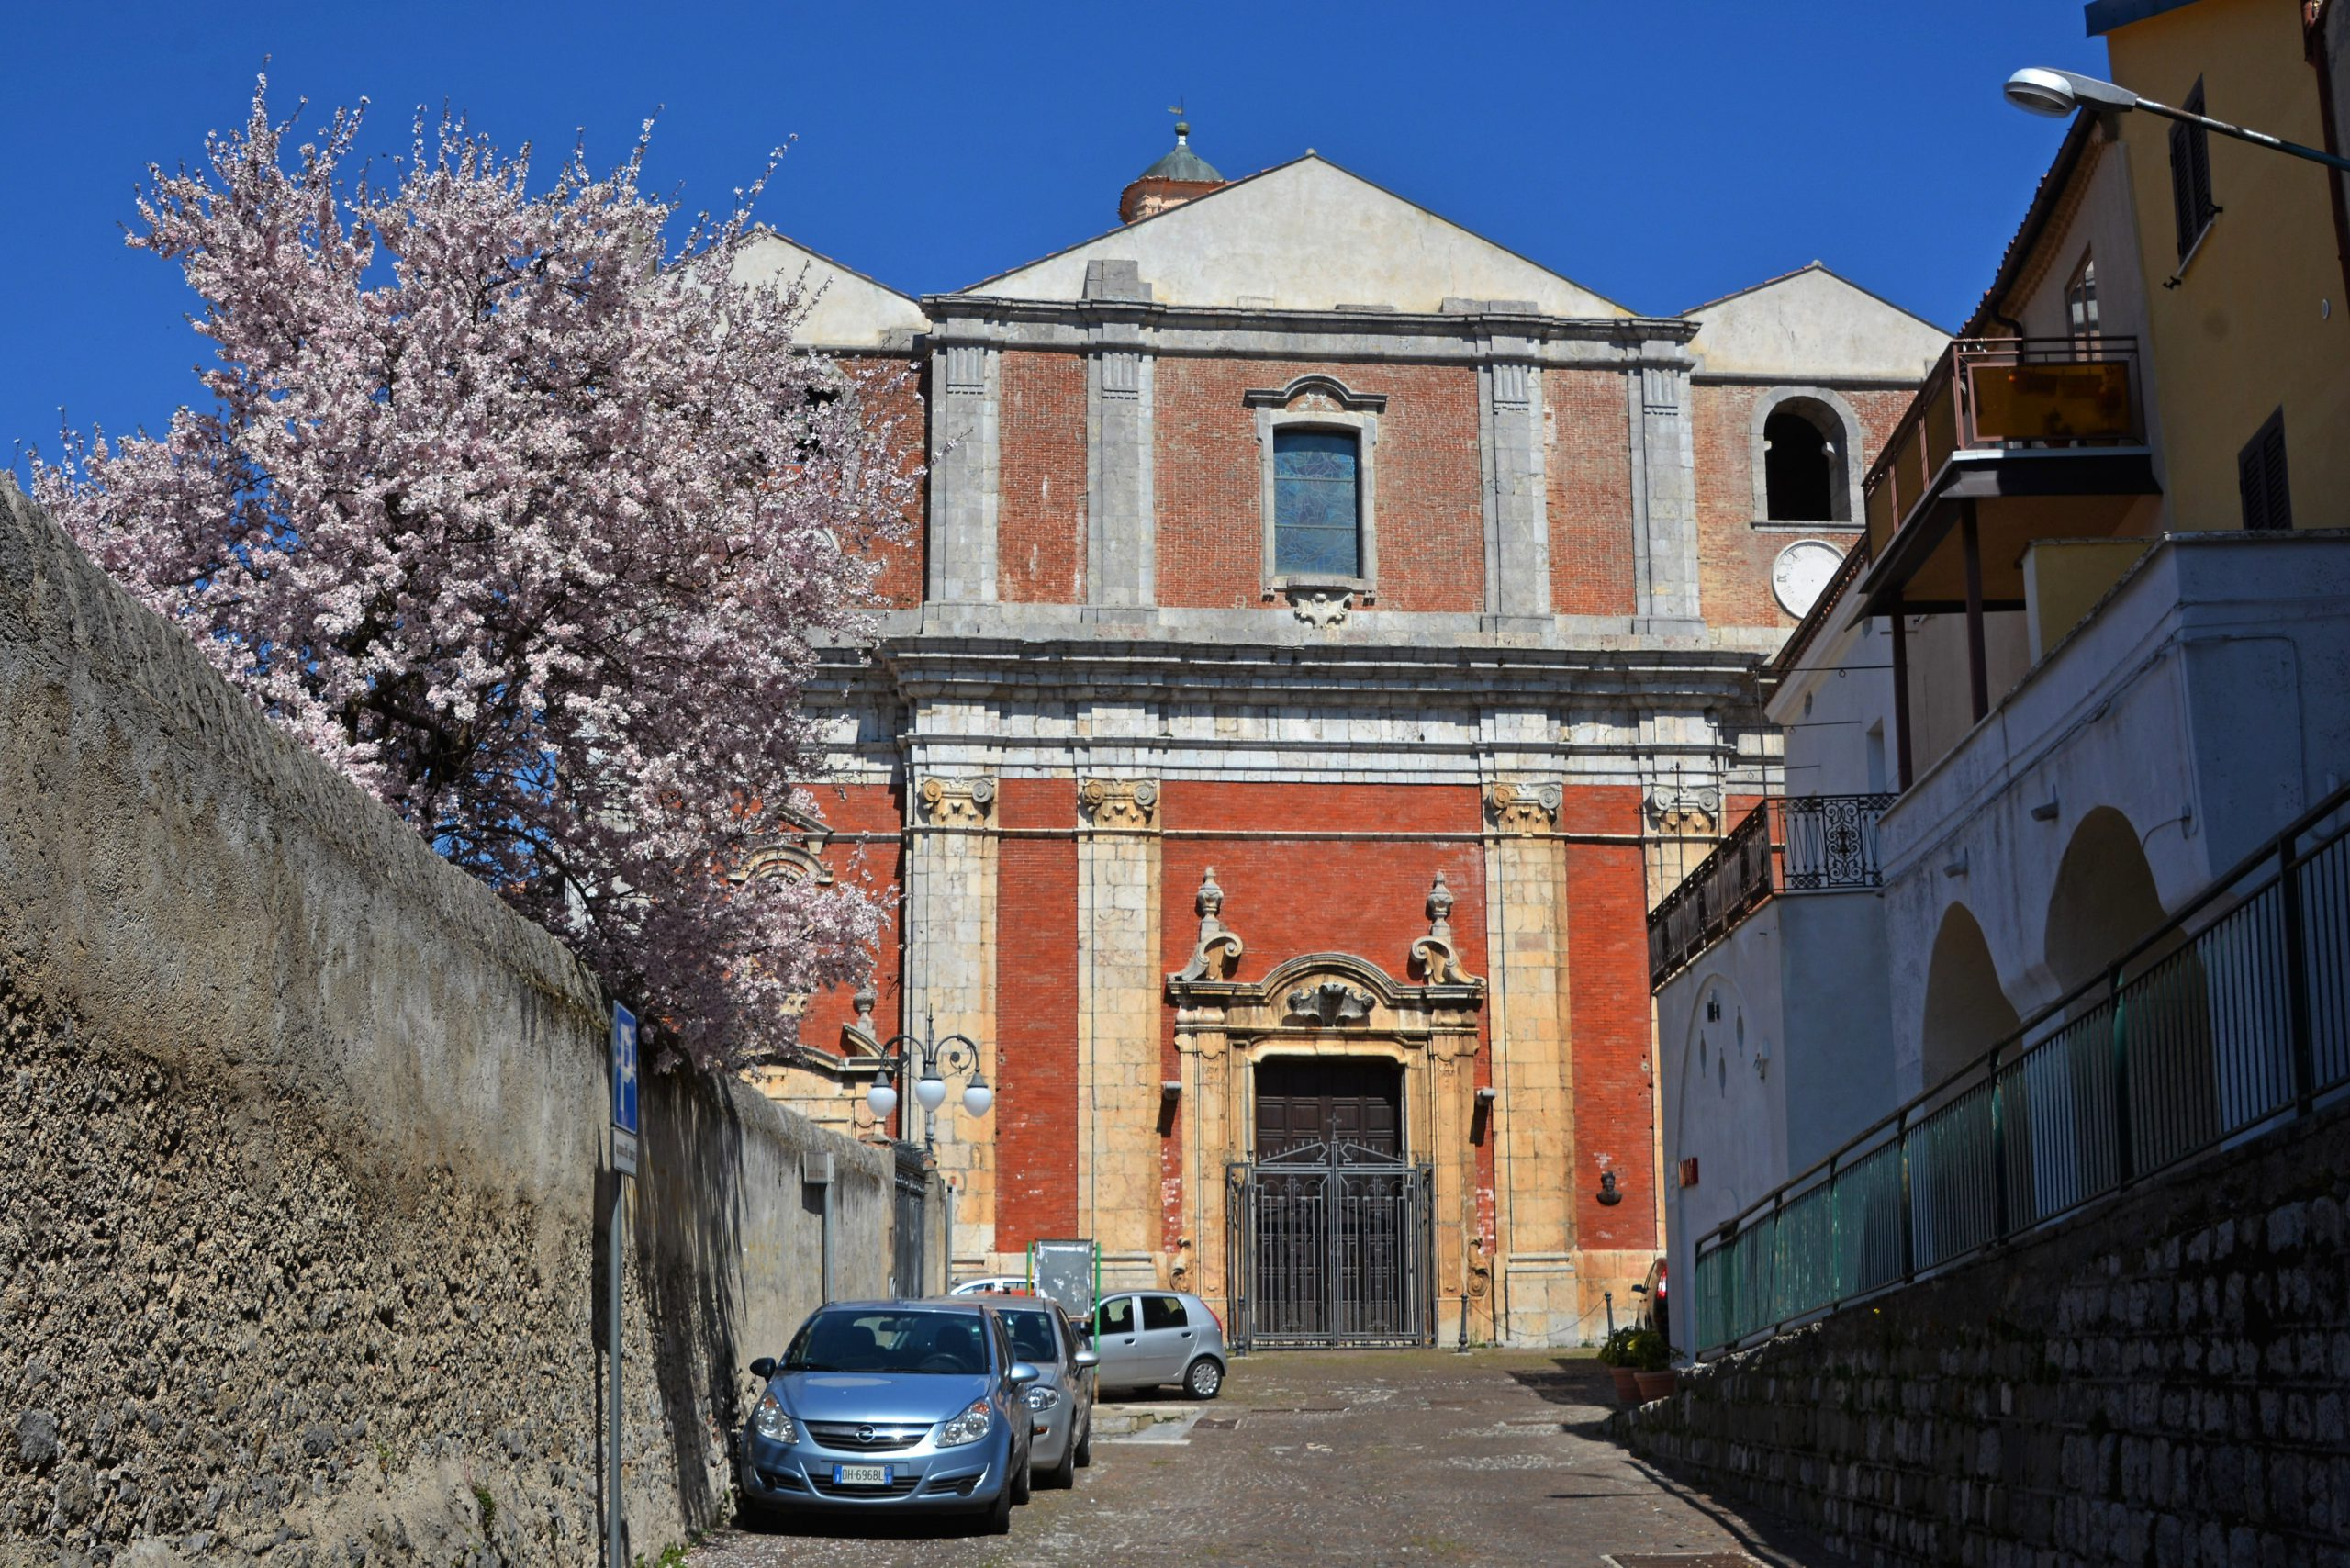 https://www.cuorebasilicata.it/wp-content/uploads/2019/01/Fotogallery-03-Chiesa-madre-santa-maria-assunta-Moliterno-DIC_6691-scaled.jpg